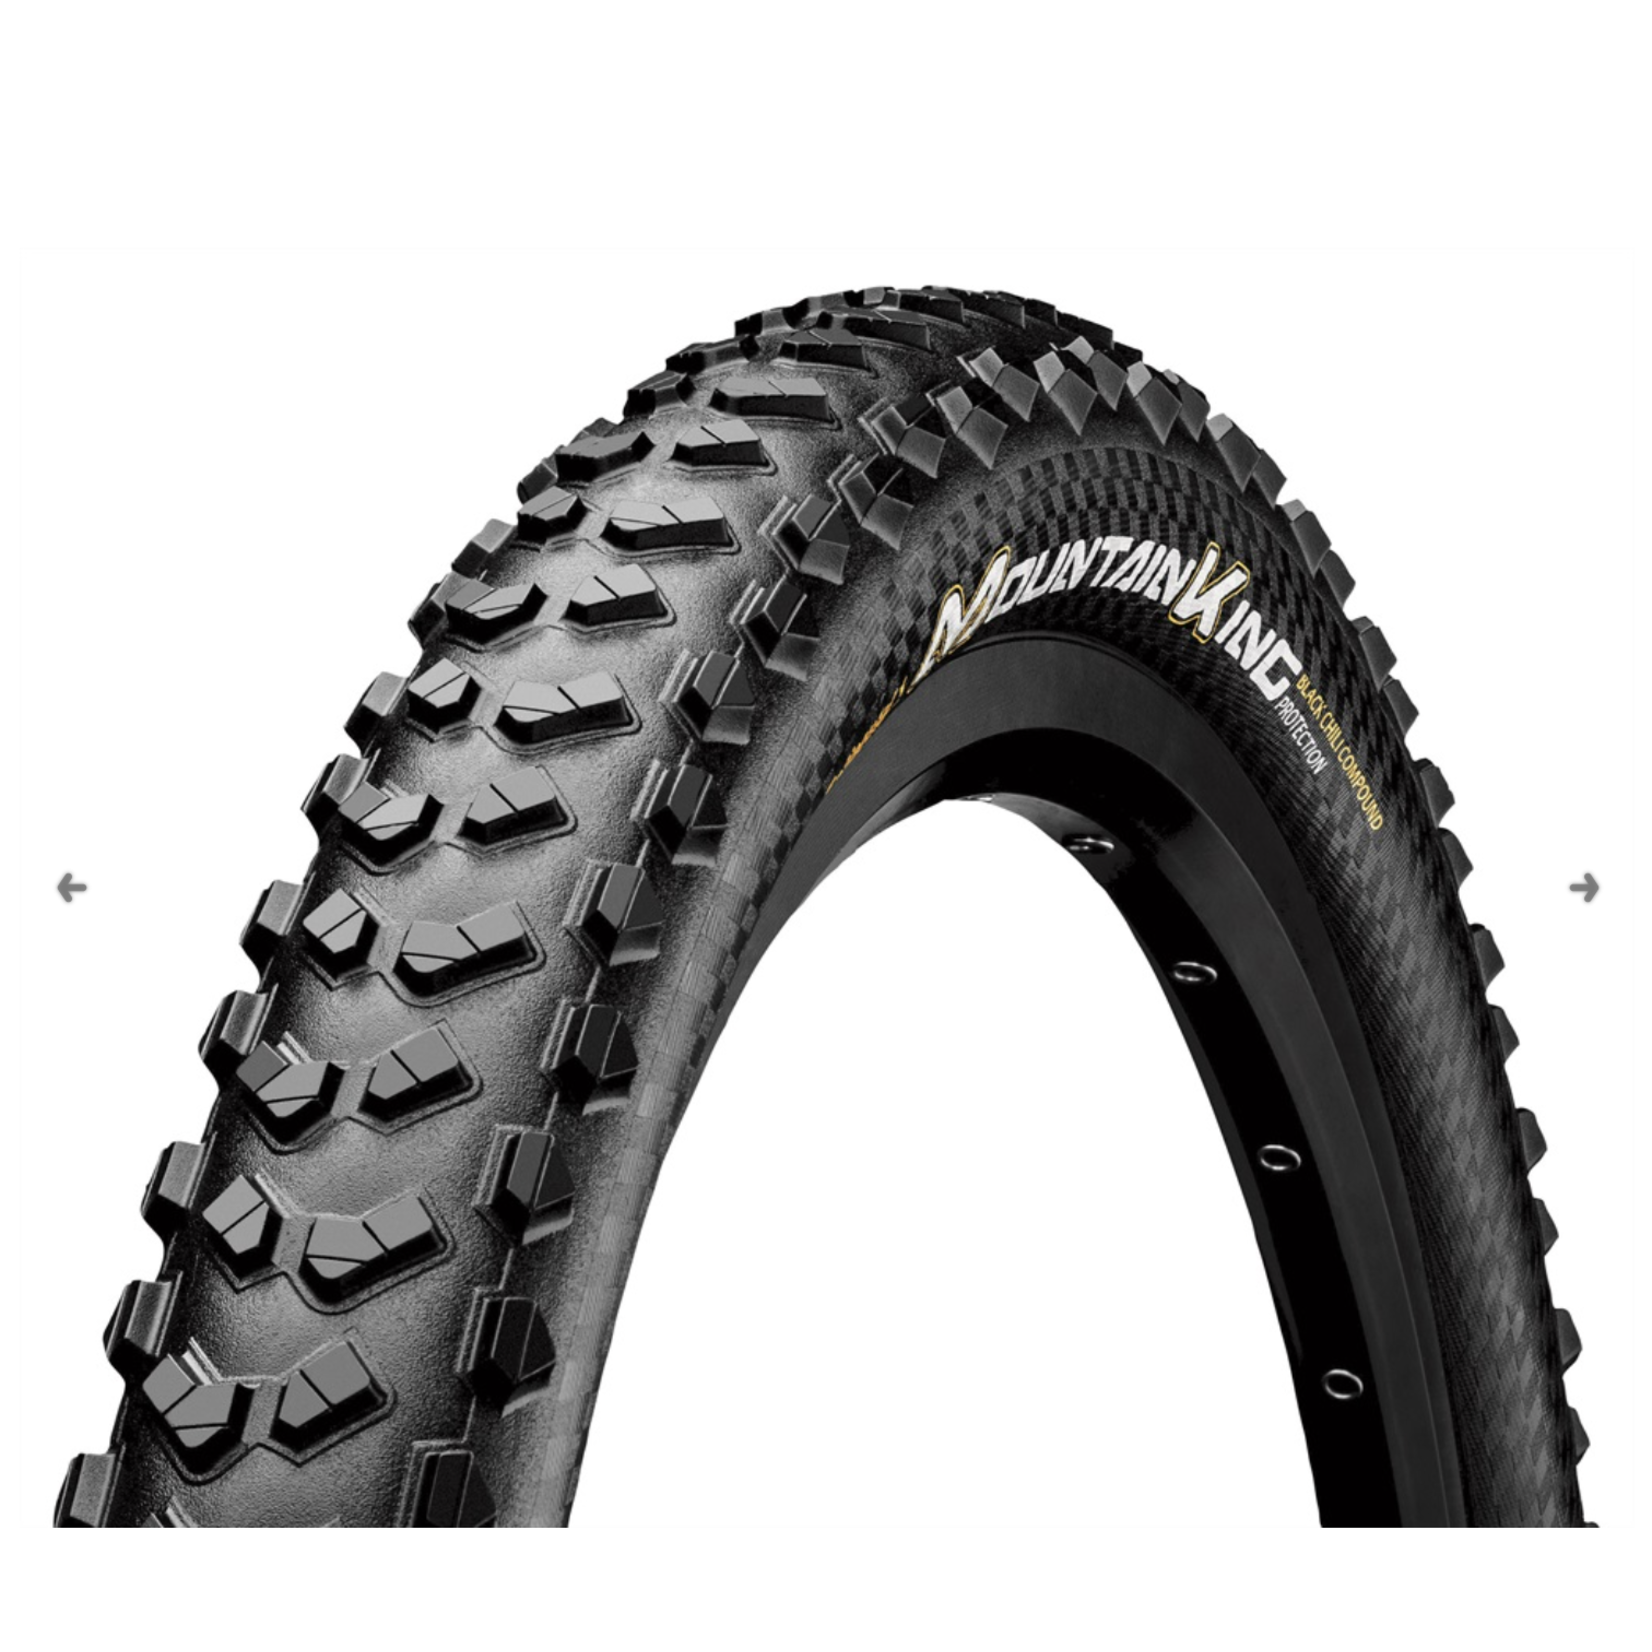 HIGHWAY 2 Continental XC/Enduro Tires Mountain King 29 x 2.3 Folding ProTection + Black Chili4019238798432